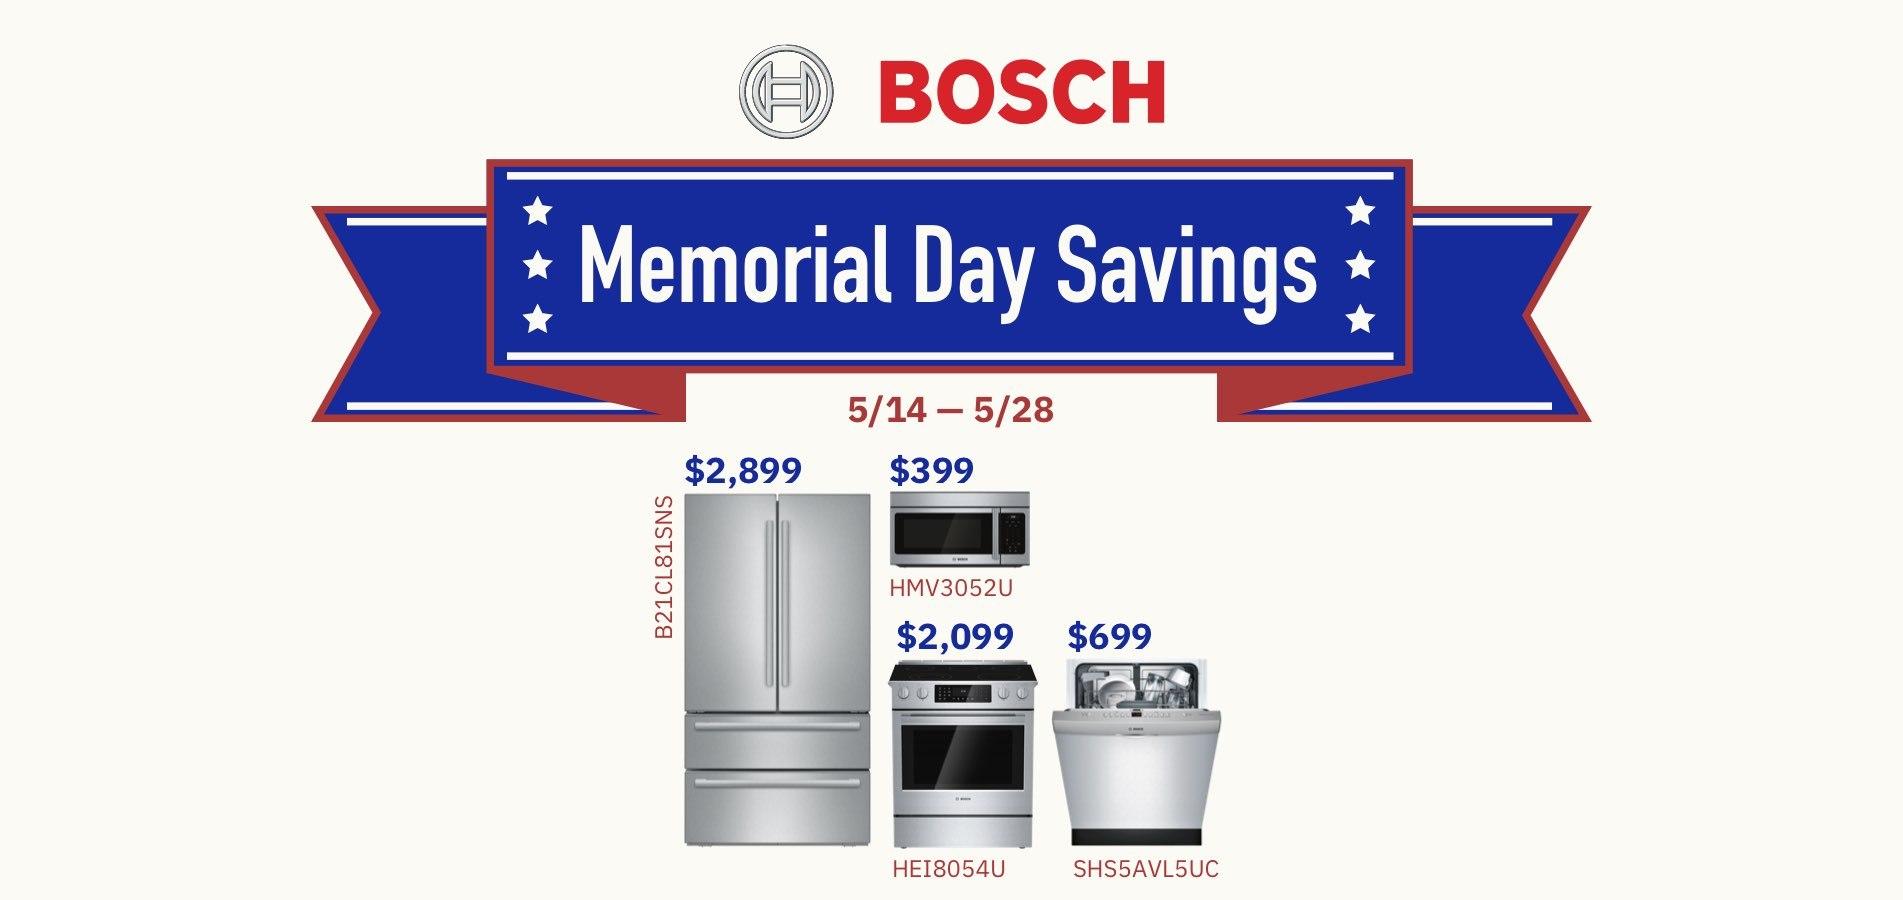 Bosch Memorial Day